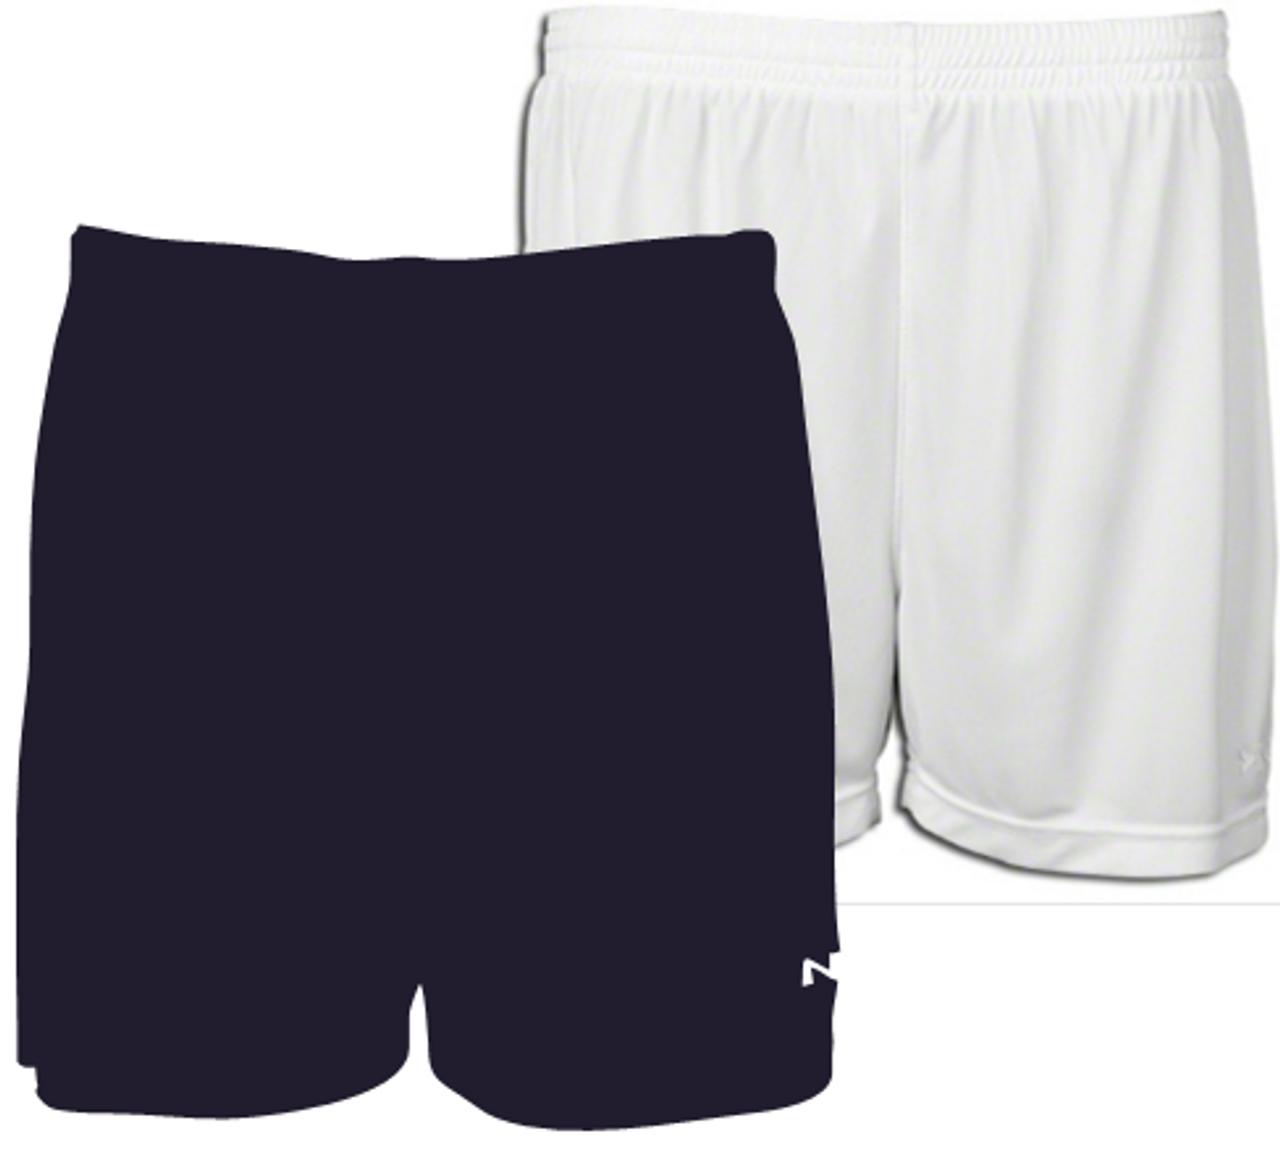 731f9e36c OF Girls Soccer Practice Shorts - RycoSports